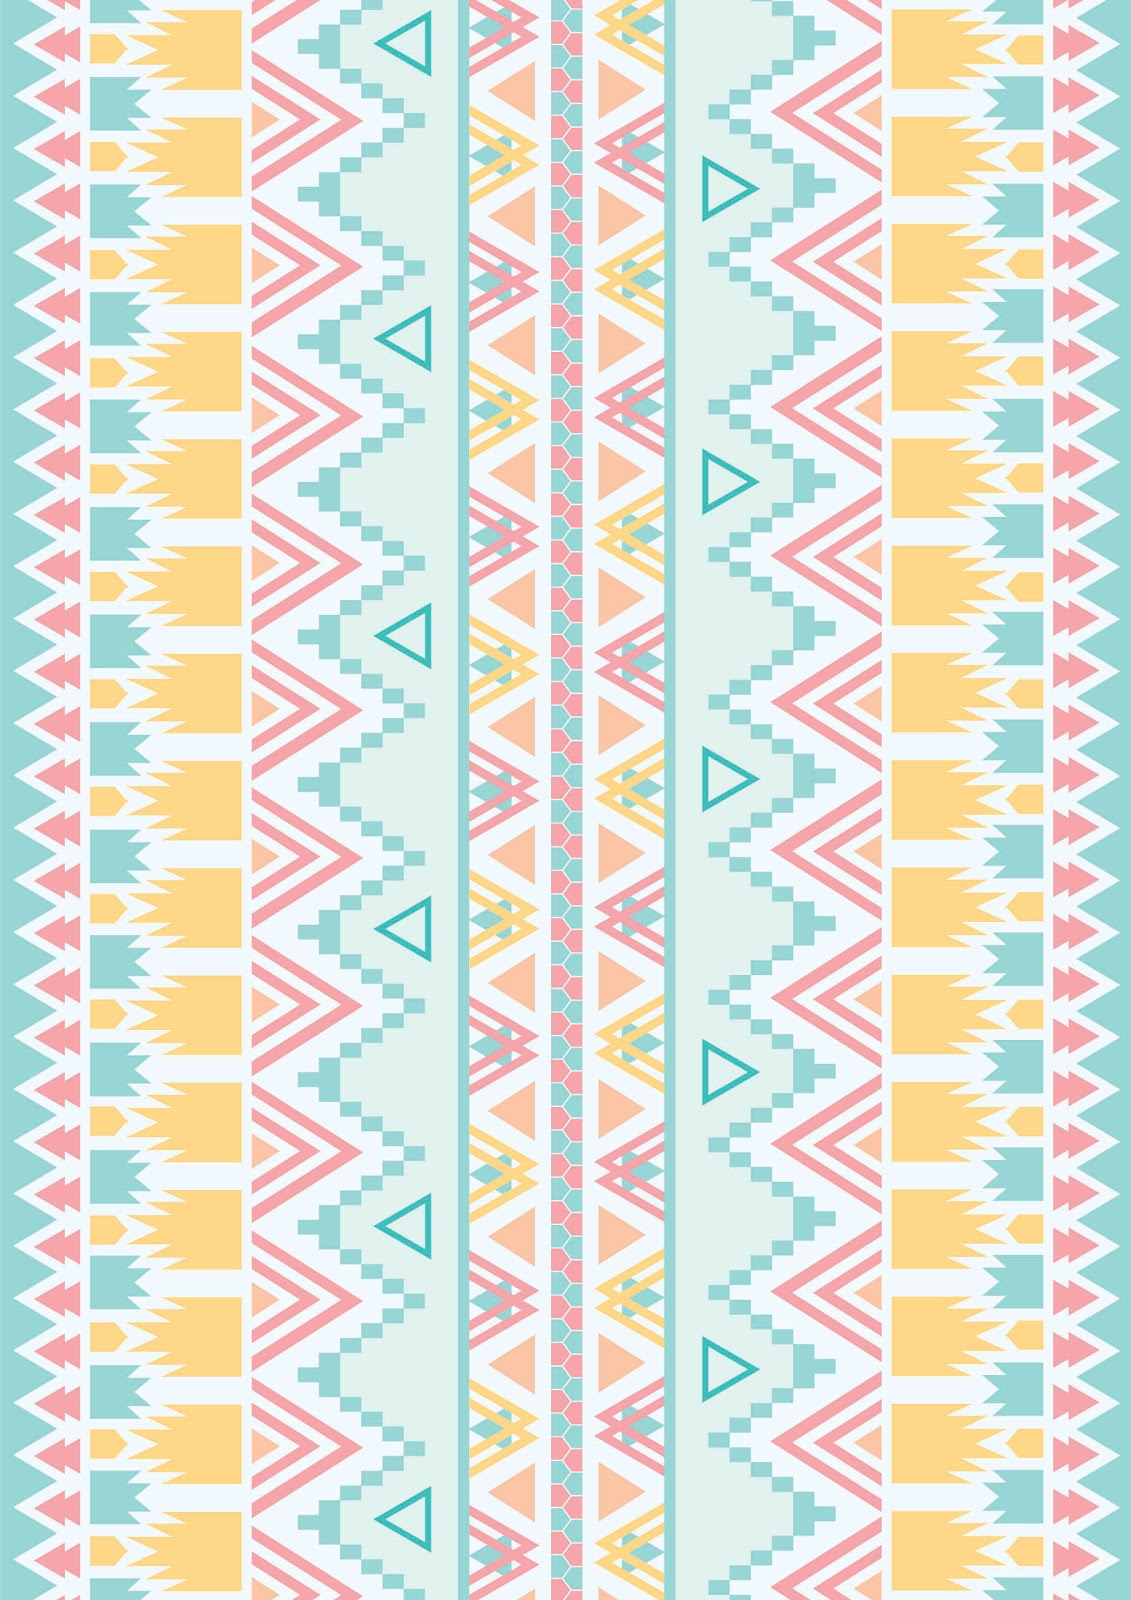 Neon Aztec Pattern Aztec pattern background